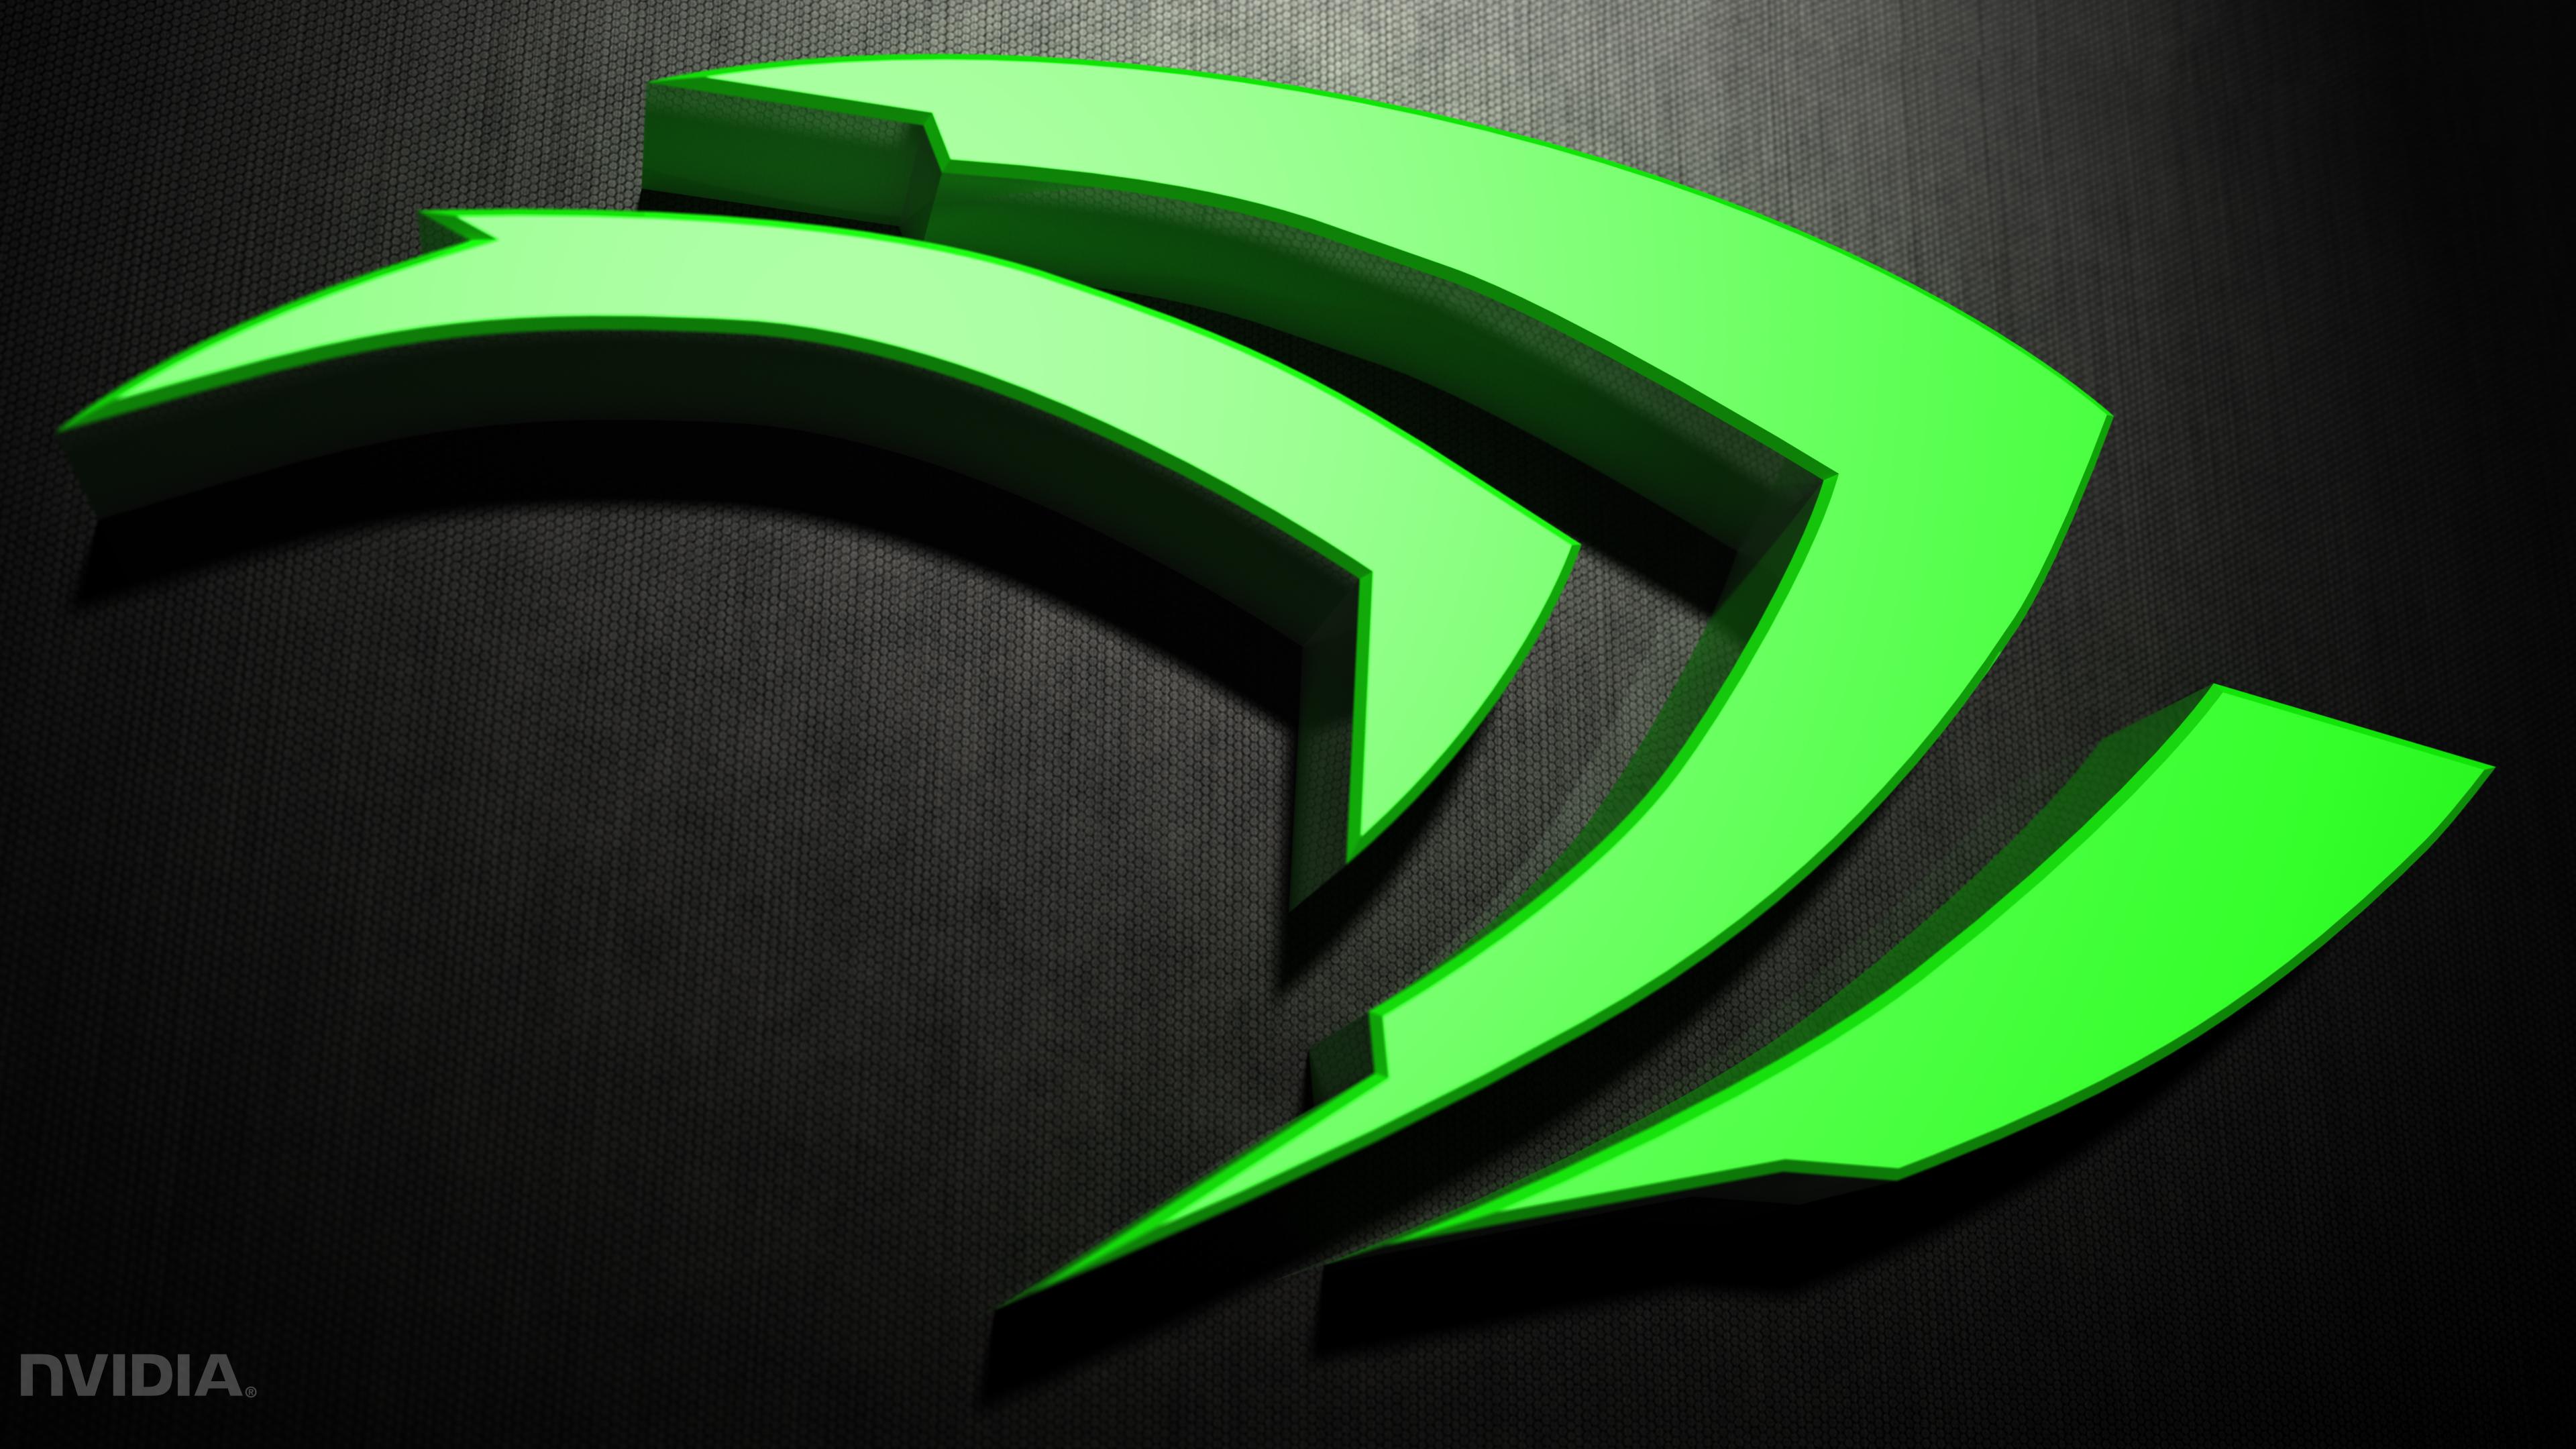 Nvidia simple 3D Computer Wallpapers Desktop Backgrounds 3840x2160 3840x2160